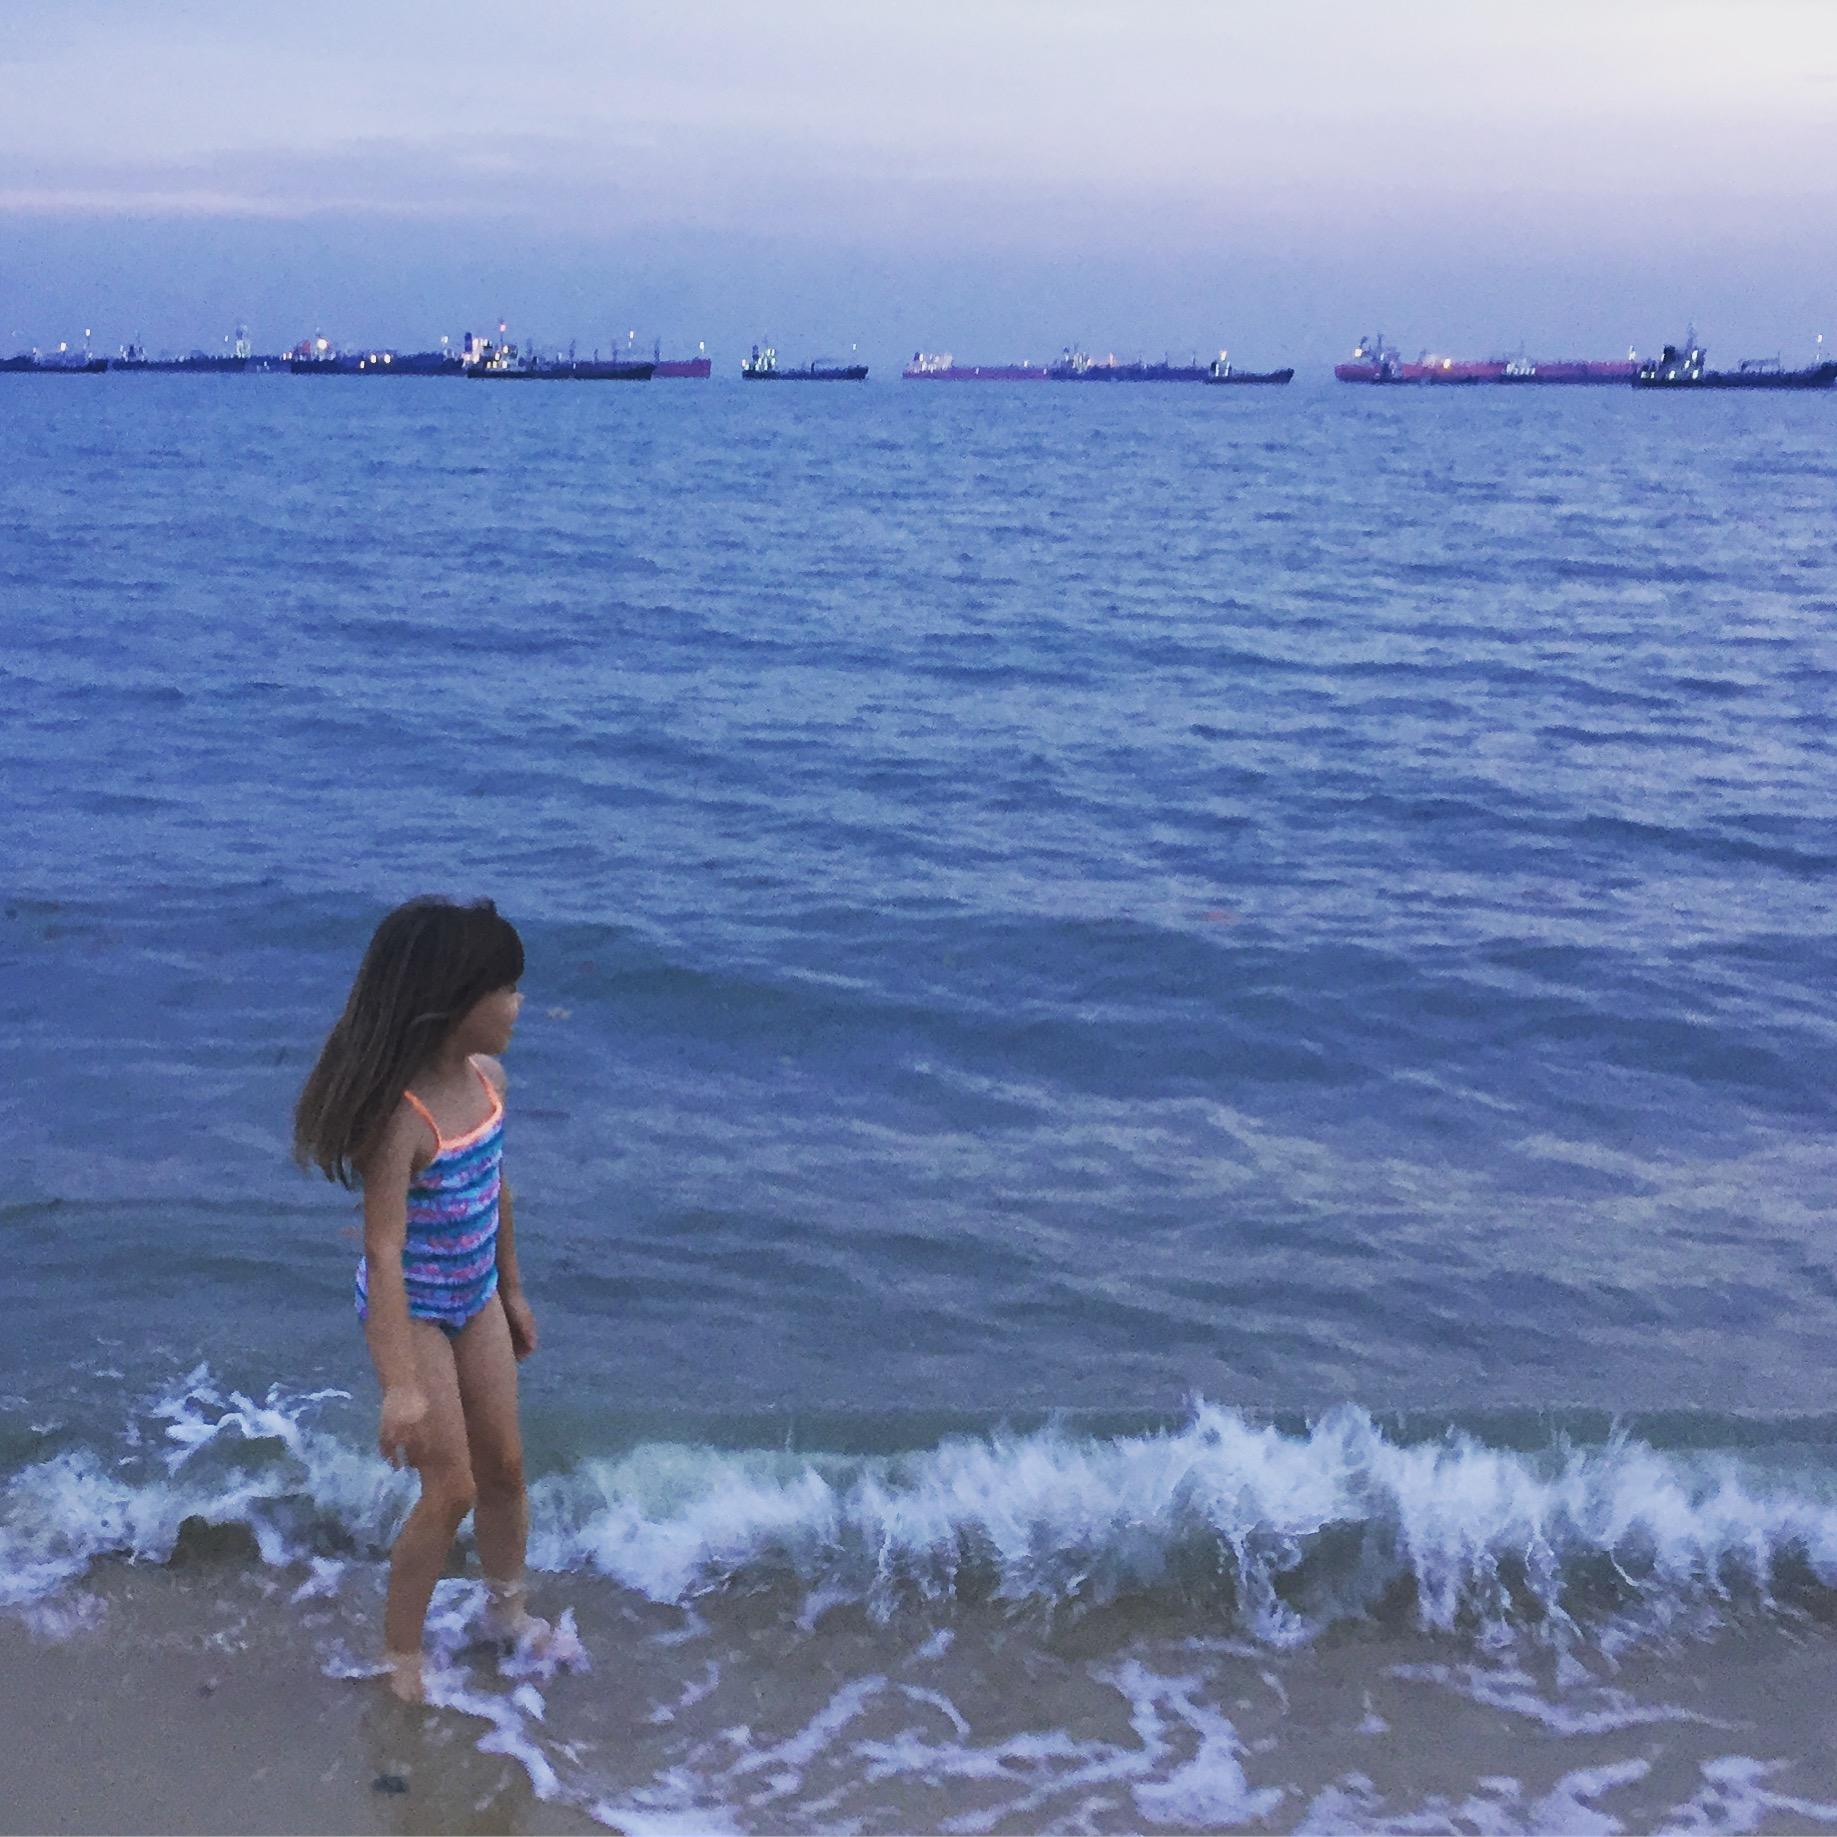 Singapore Straits, Singapore